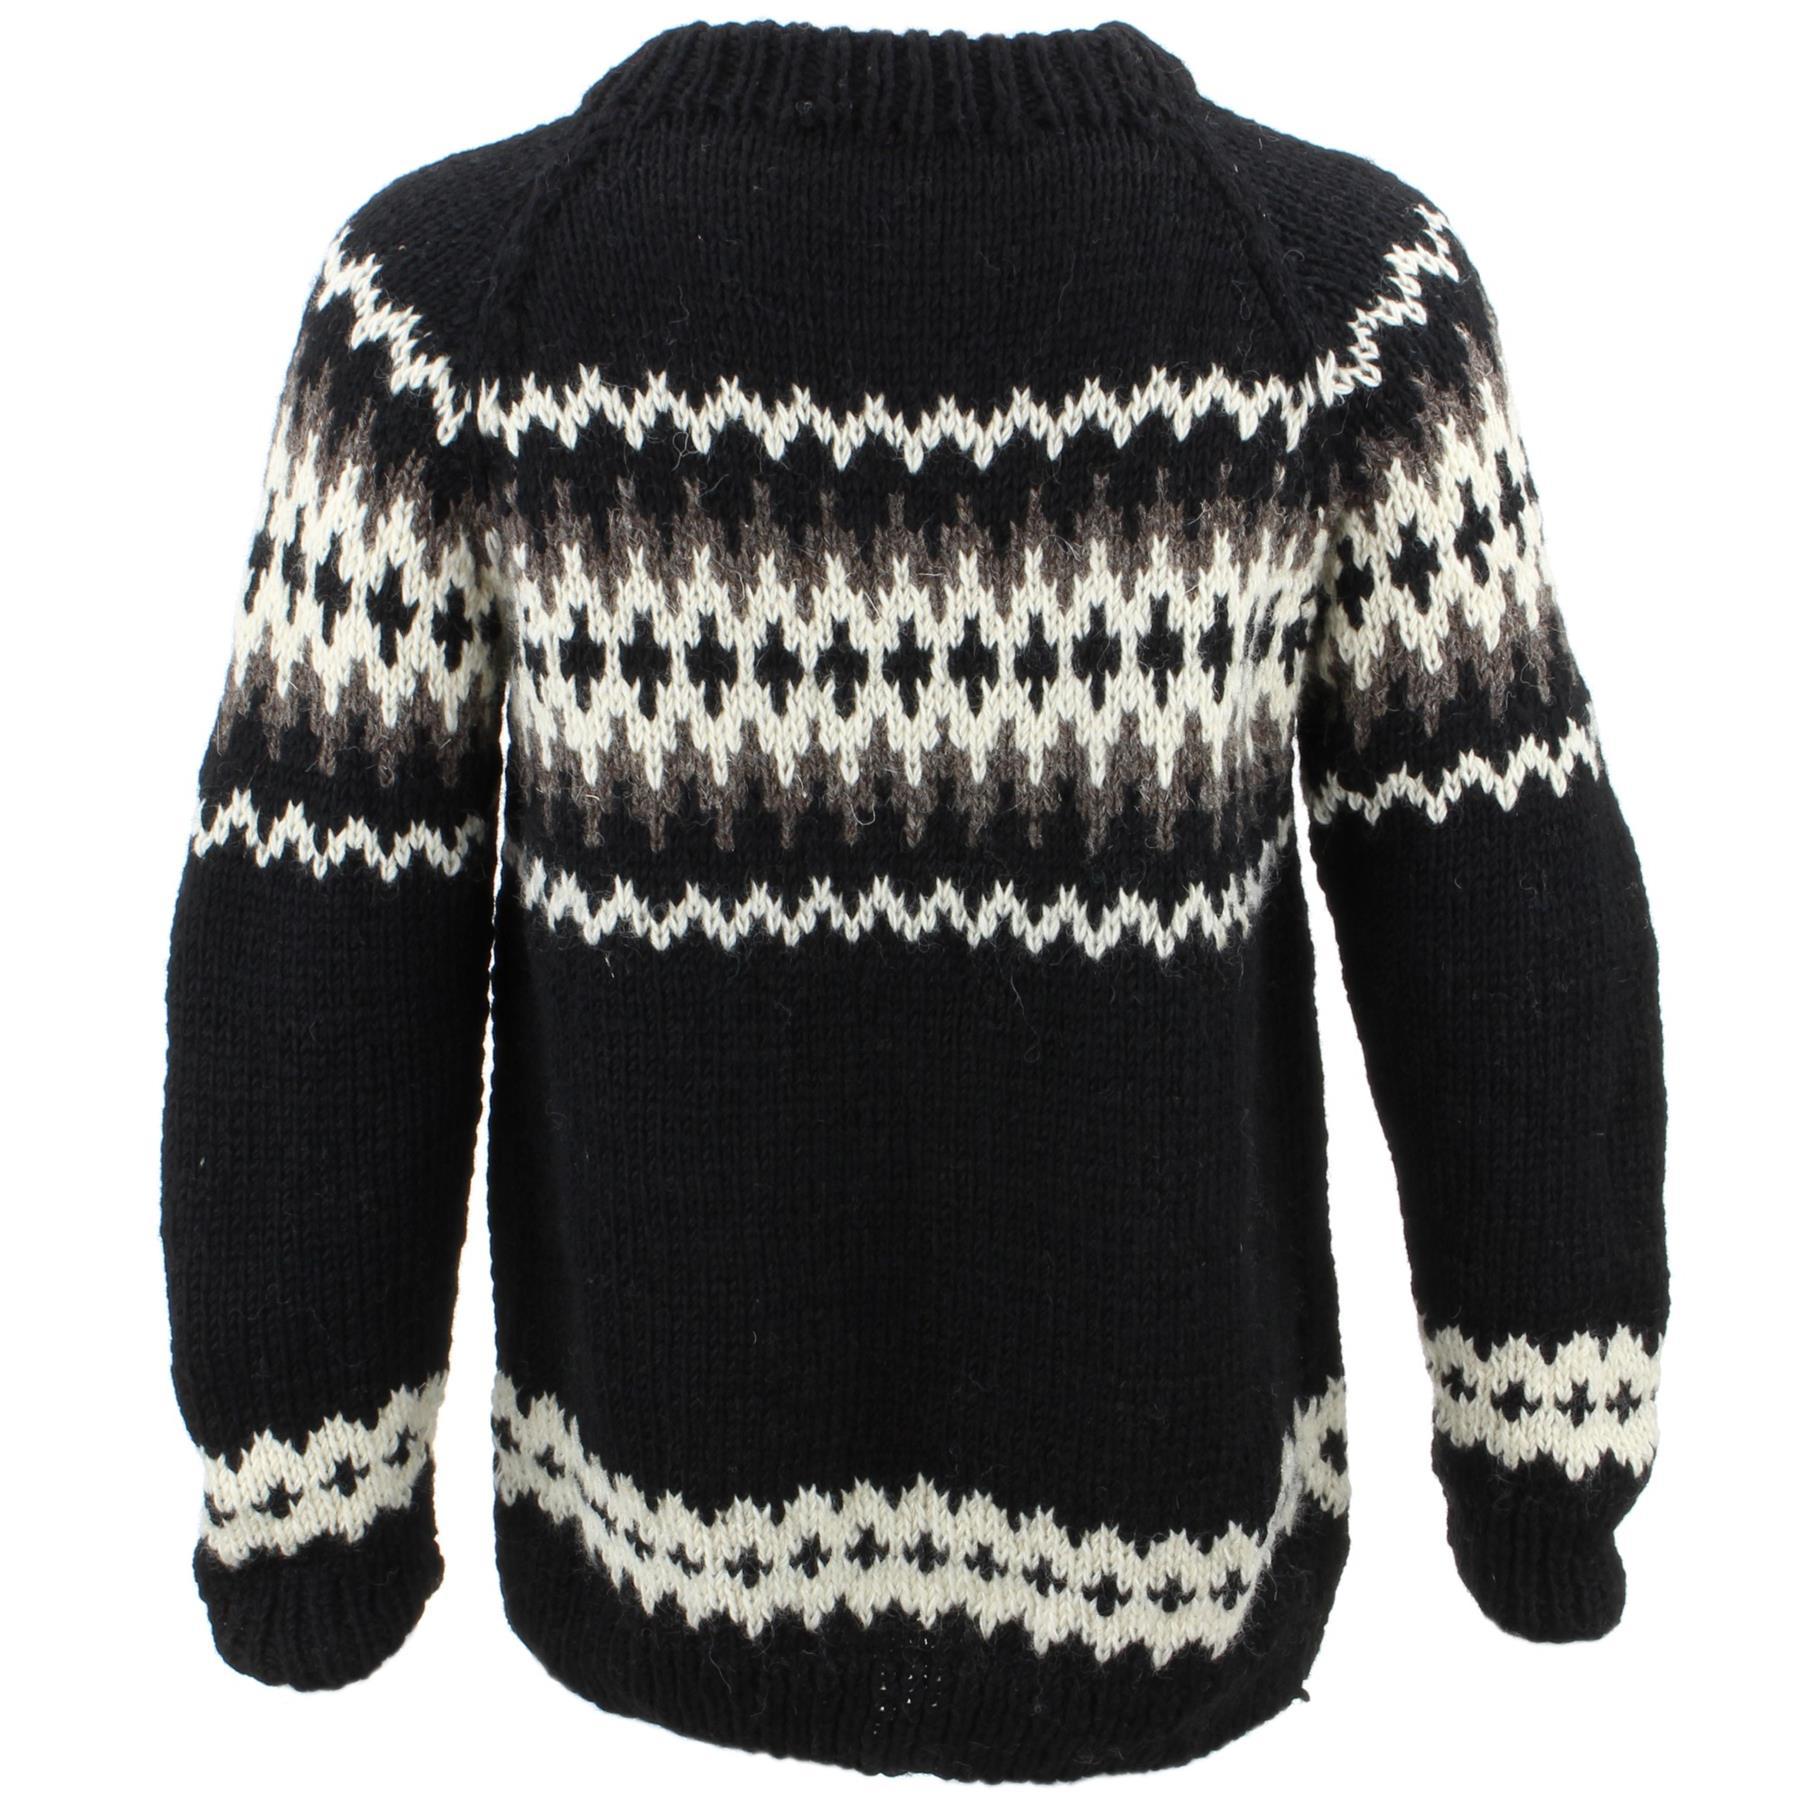 thumbnail 22 - Wool Knit Jumper Sweater Pullover Fairisle Nordic Abstract Warm Nepal Loose